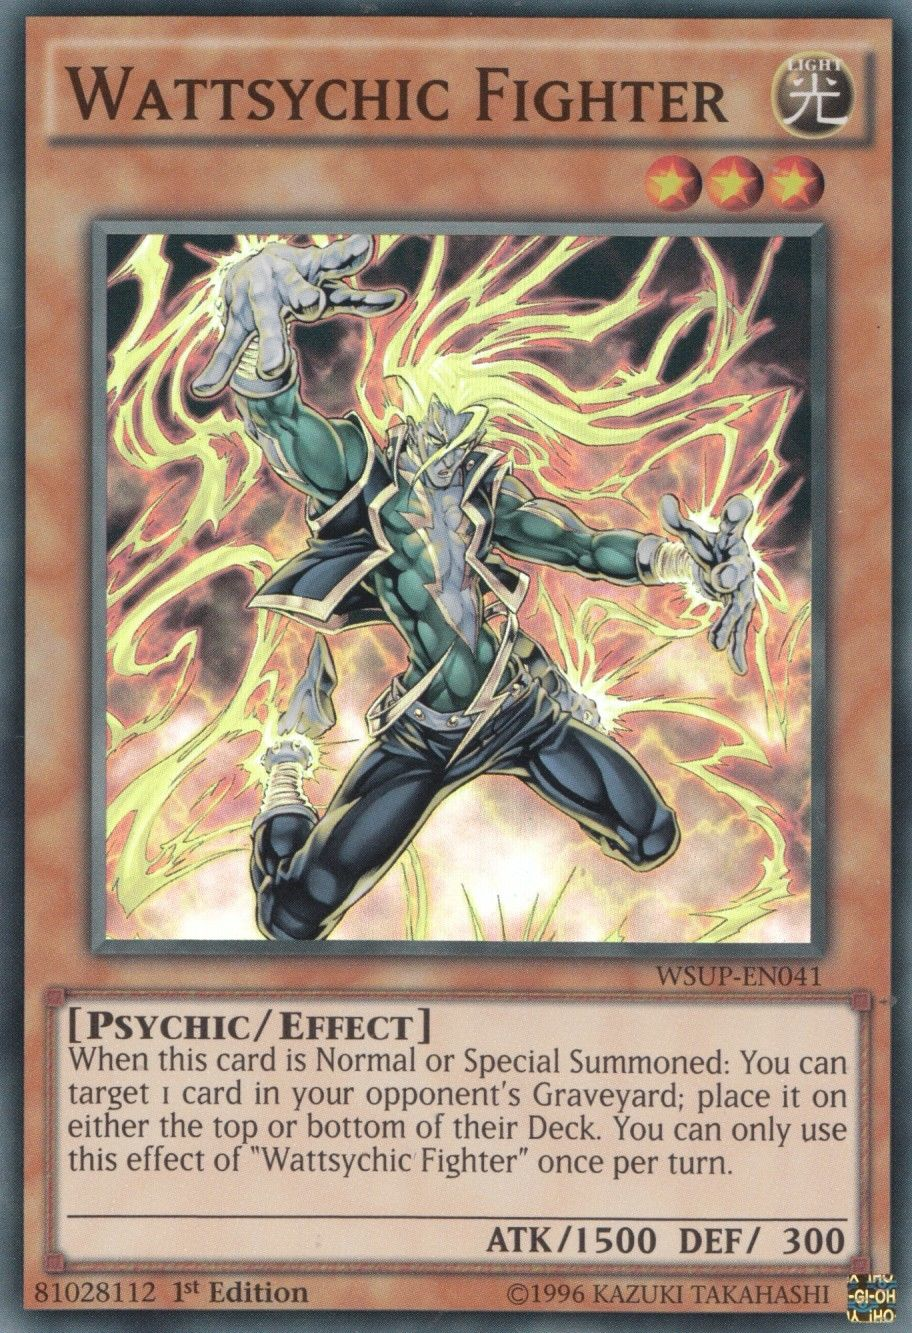 wattsychic fighter